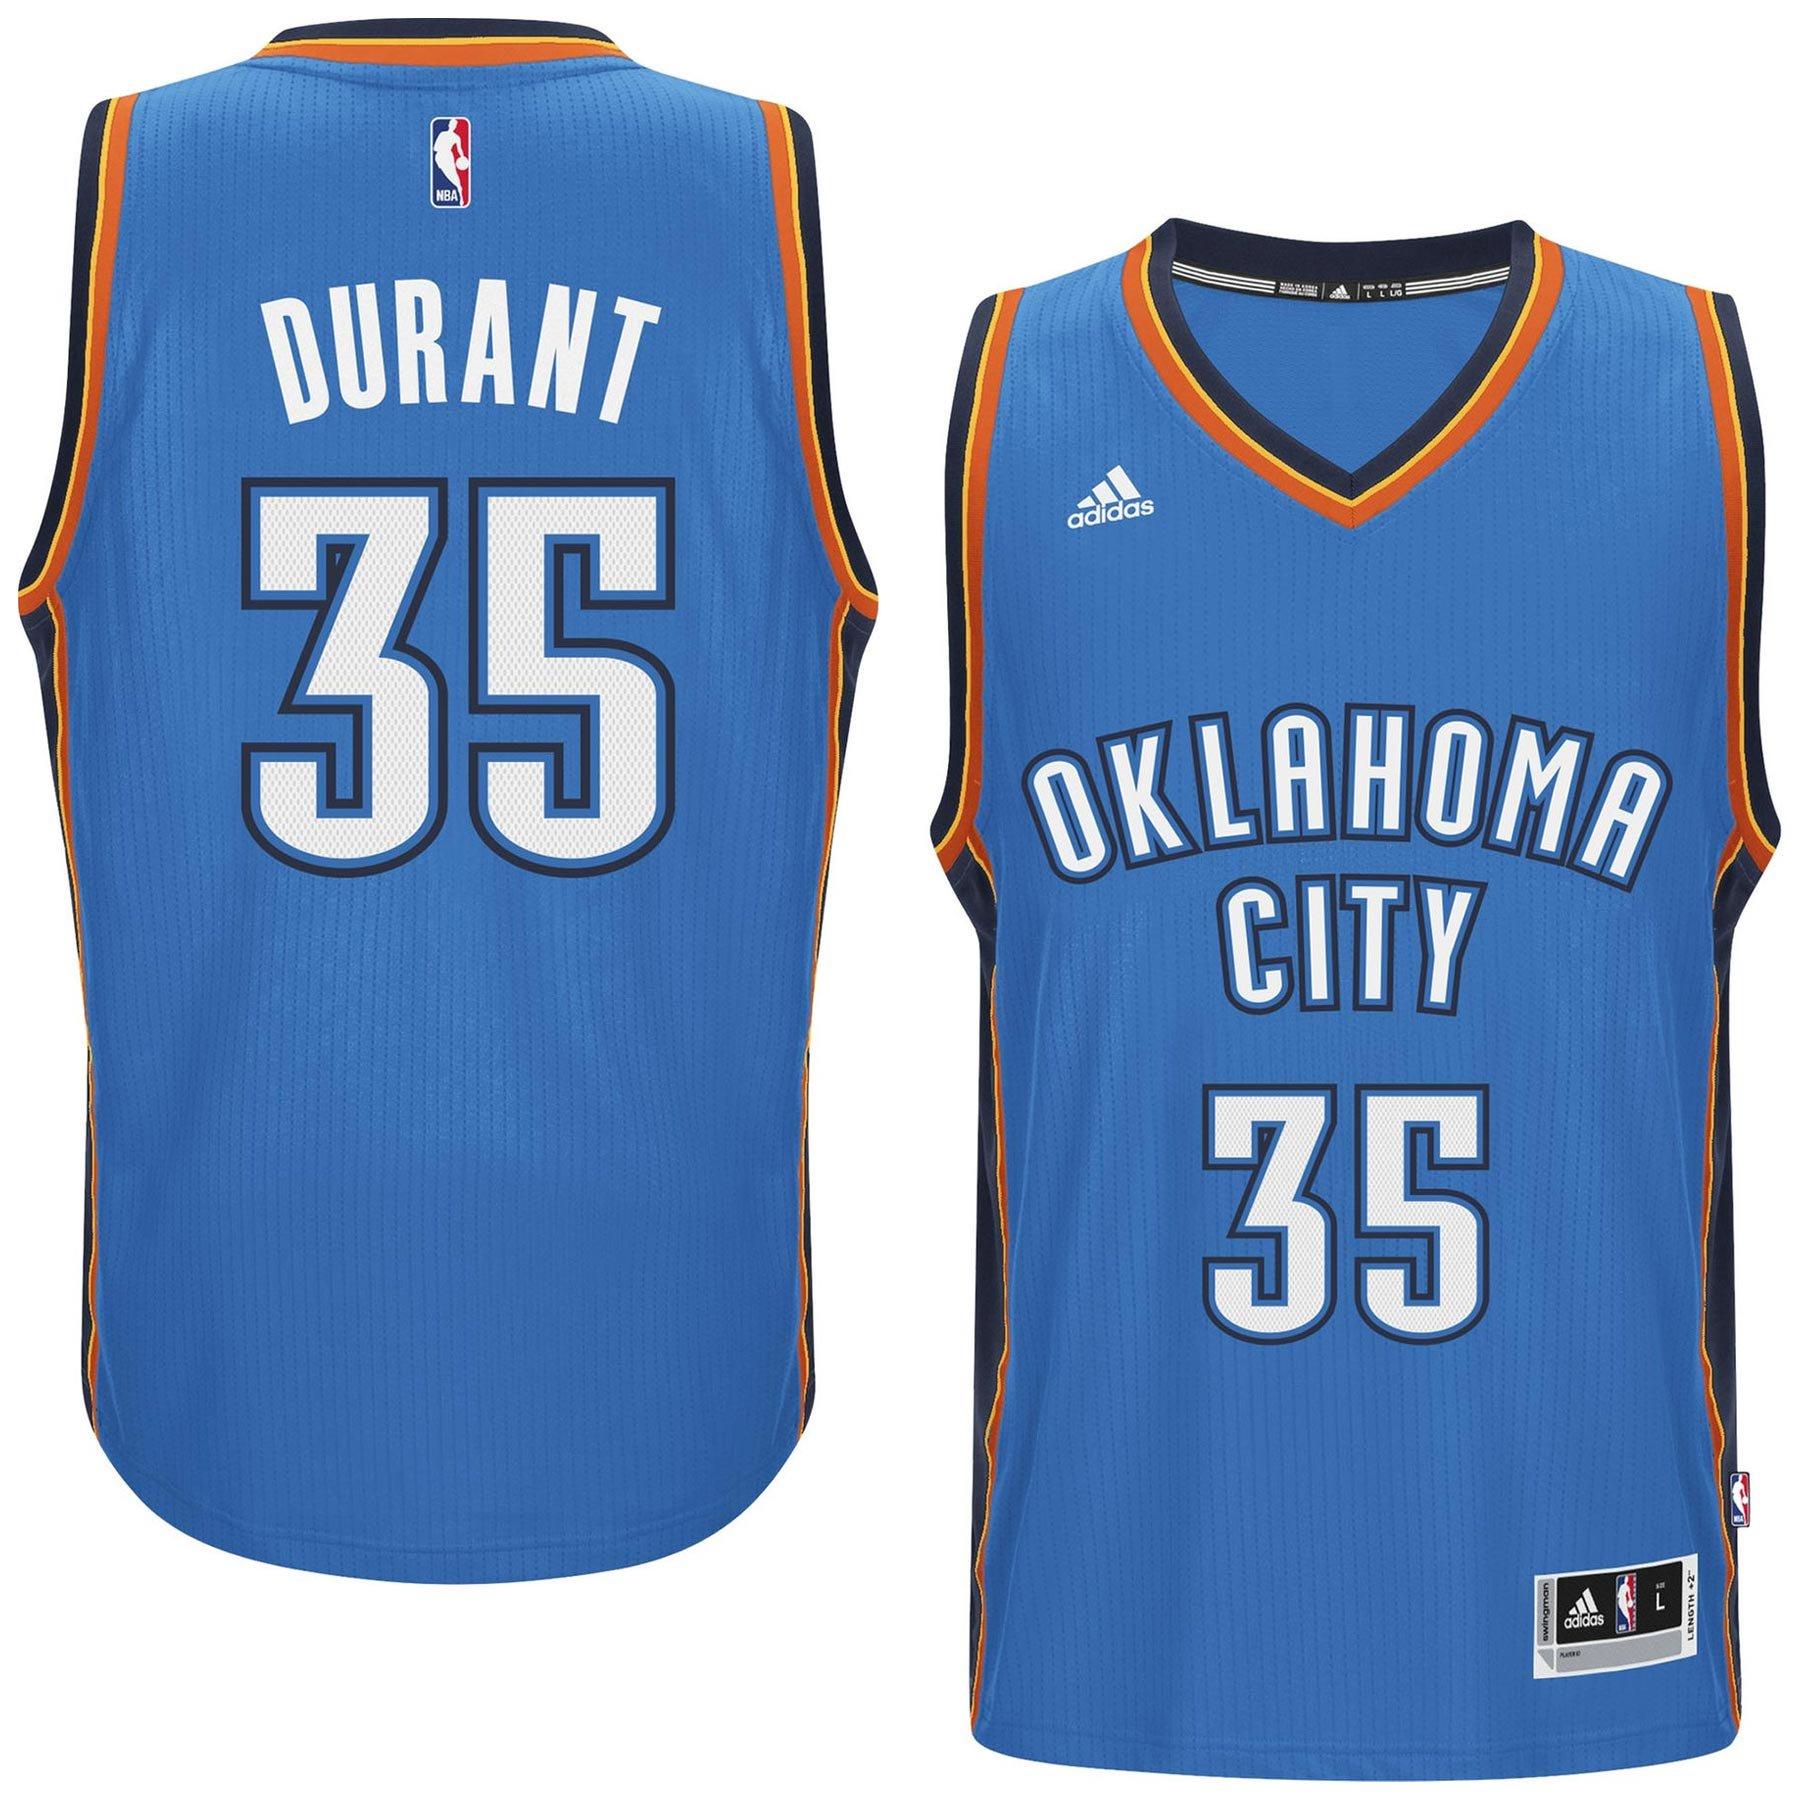 promo code 37ed5 85077 Kevin Durant Oklahoma City Thunder NBA Swingman Road Replica ...